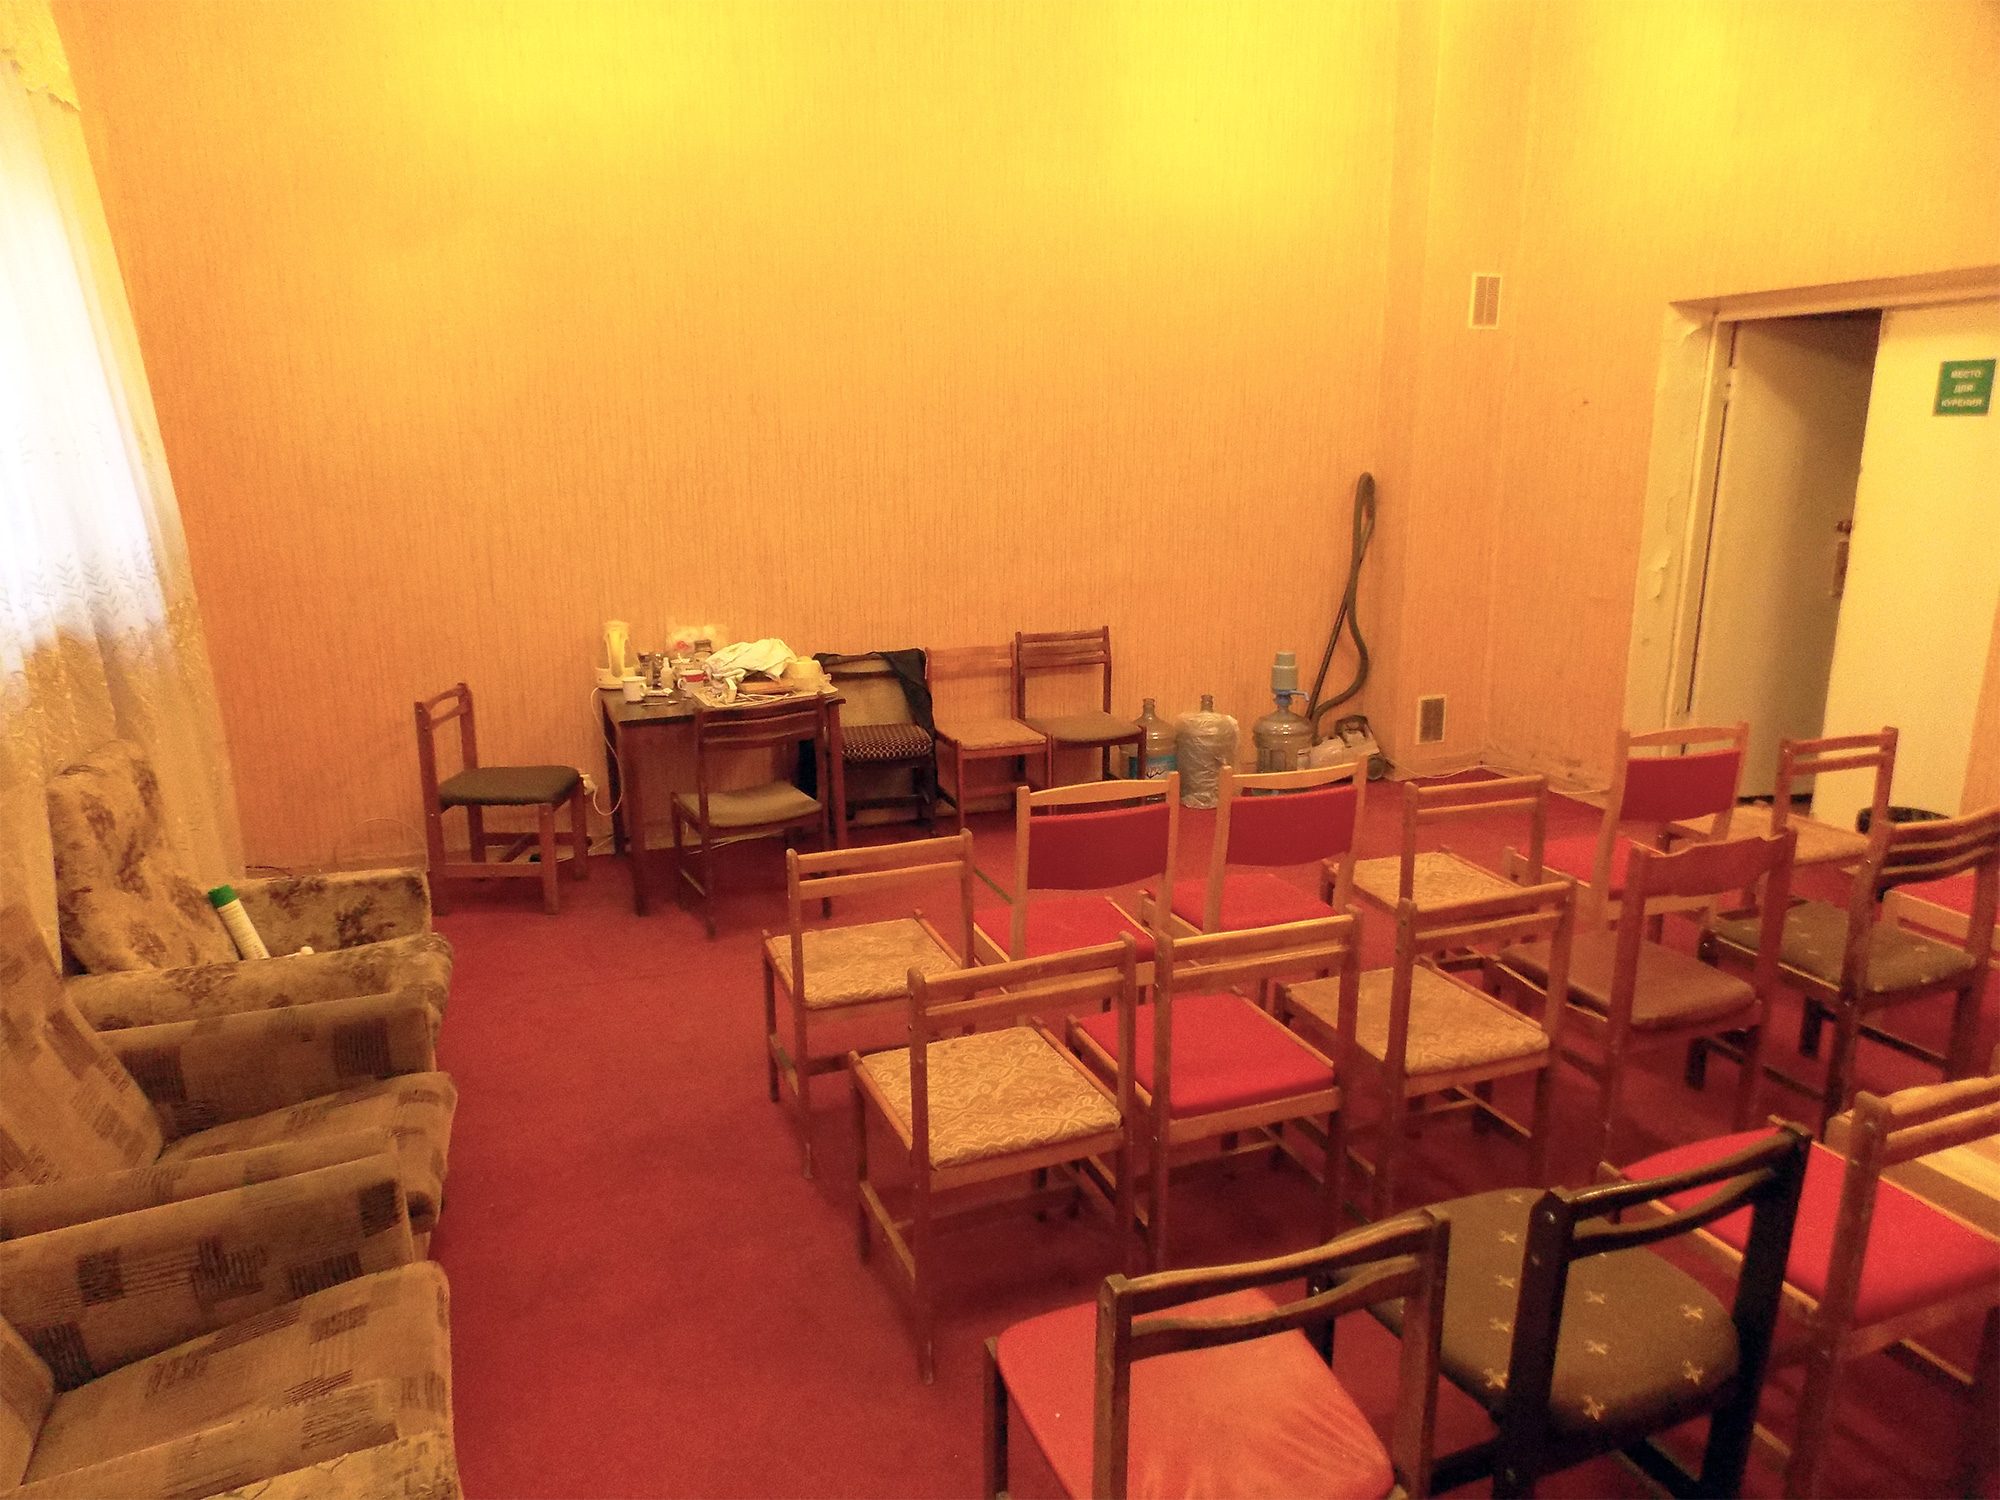 конференц-зал в Твери